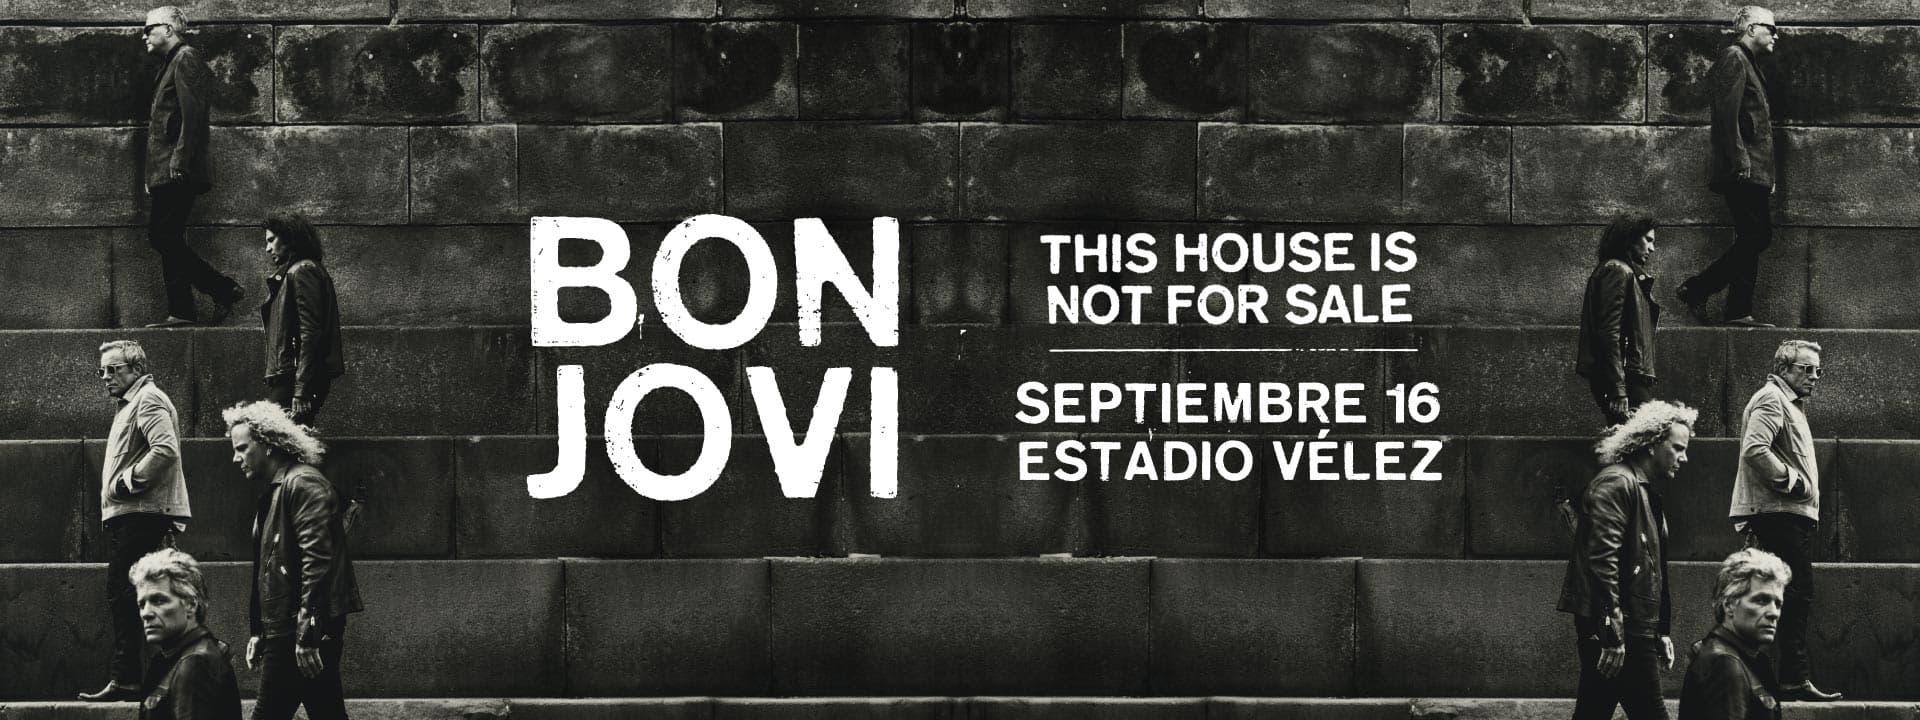 Bon Jovi @ Buenos Aires, Argentina Sept. 16, 2017